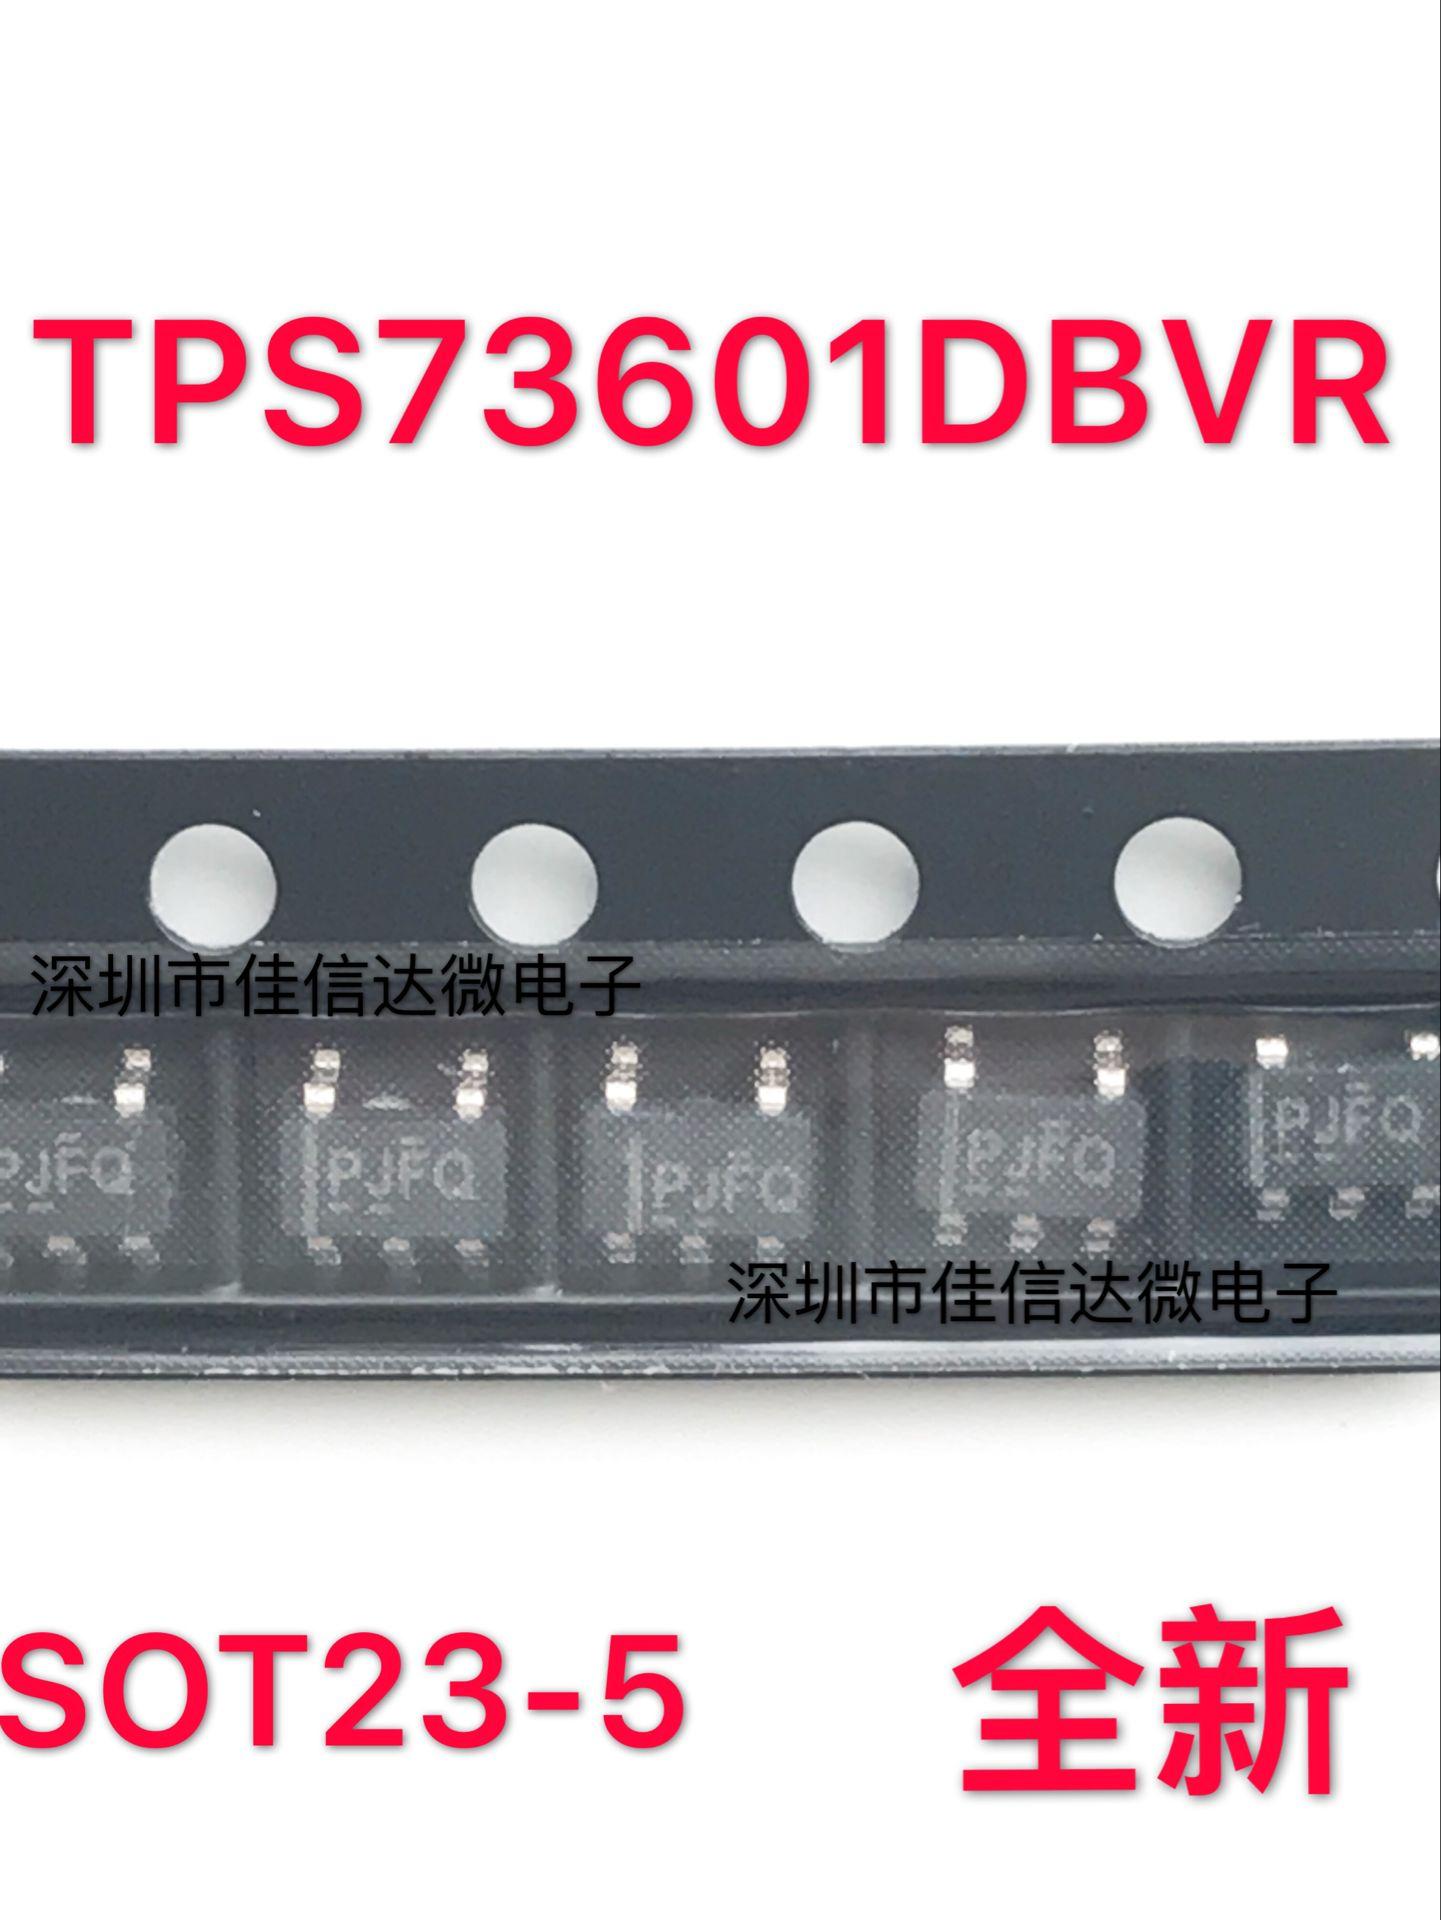 100% neue Original 5 teile/los Hohe Qualität TPS73601DBVR TPS73601 SOT23-5 PJFQ